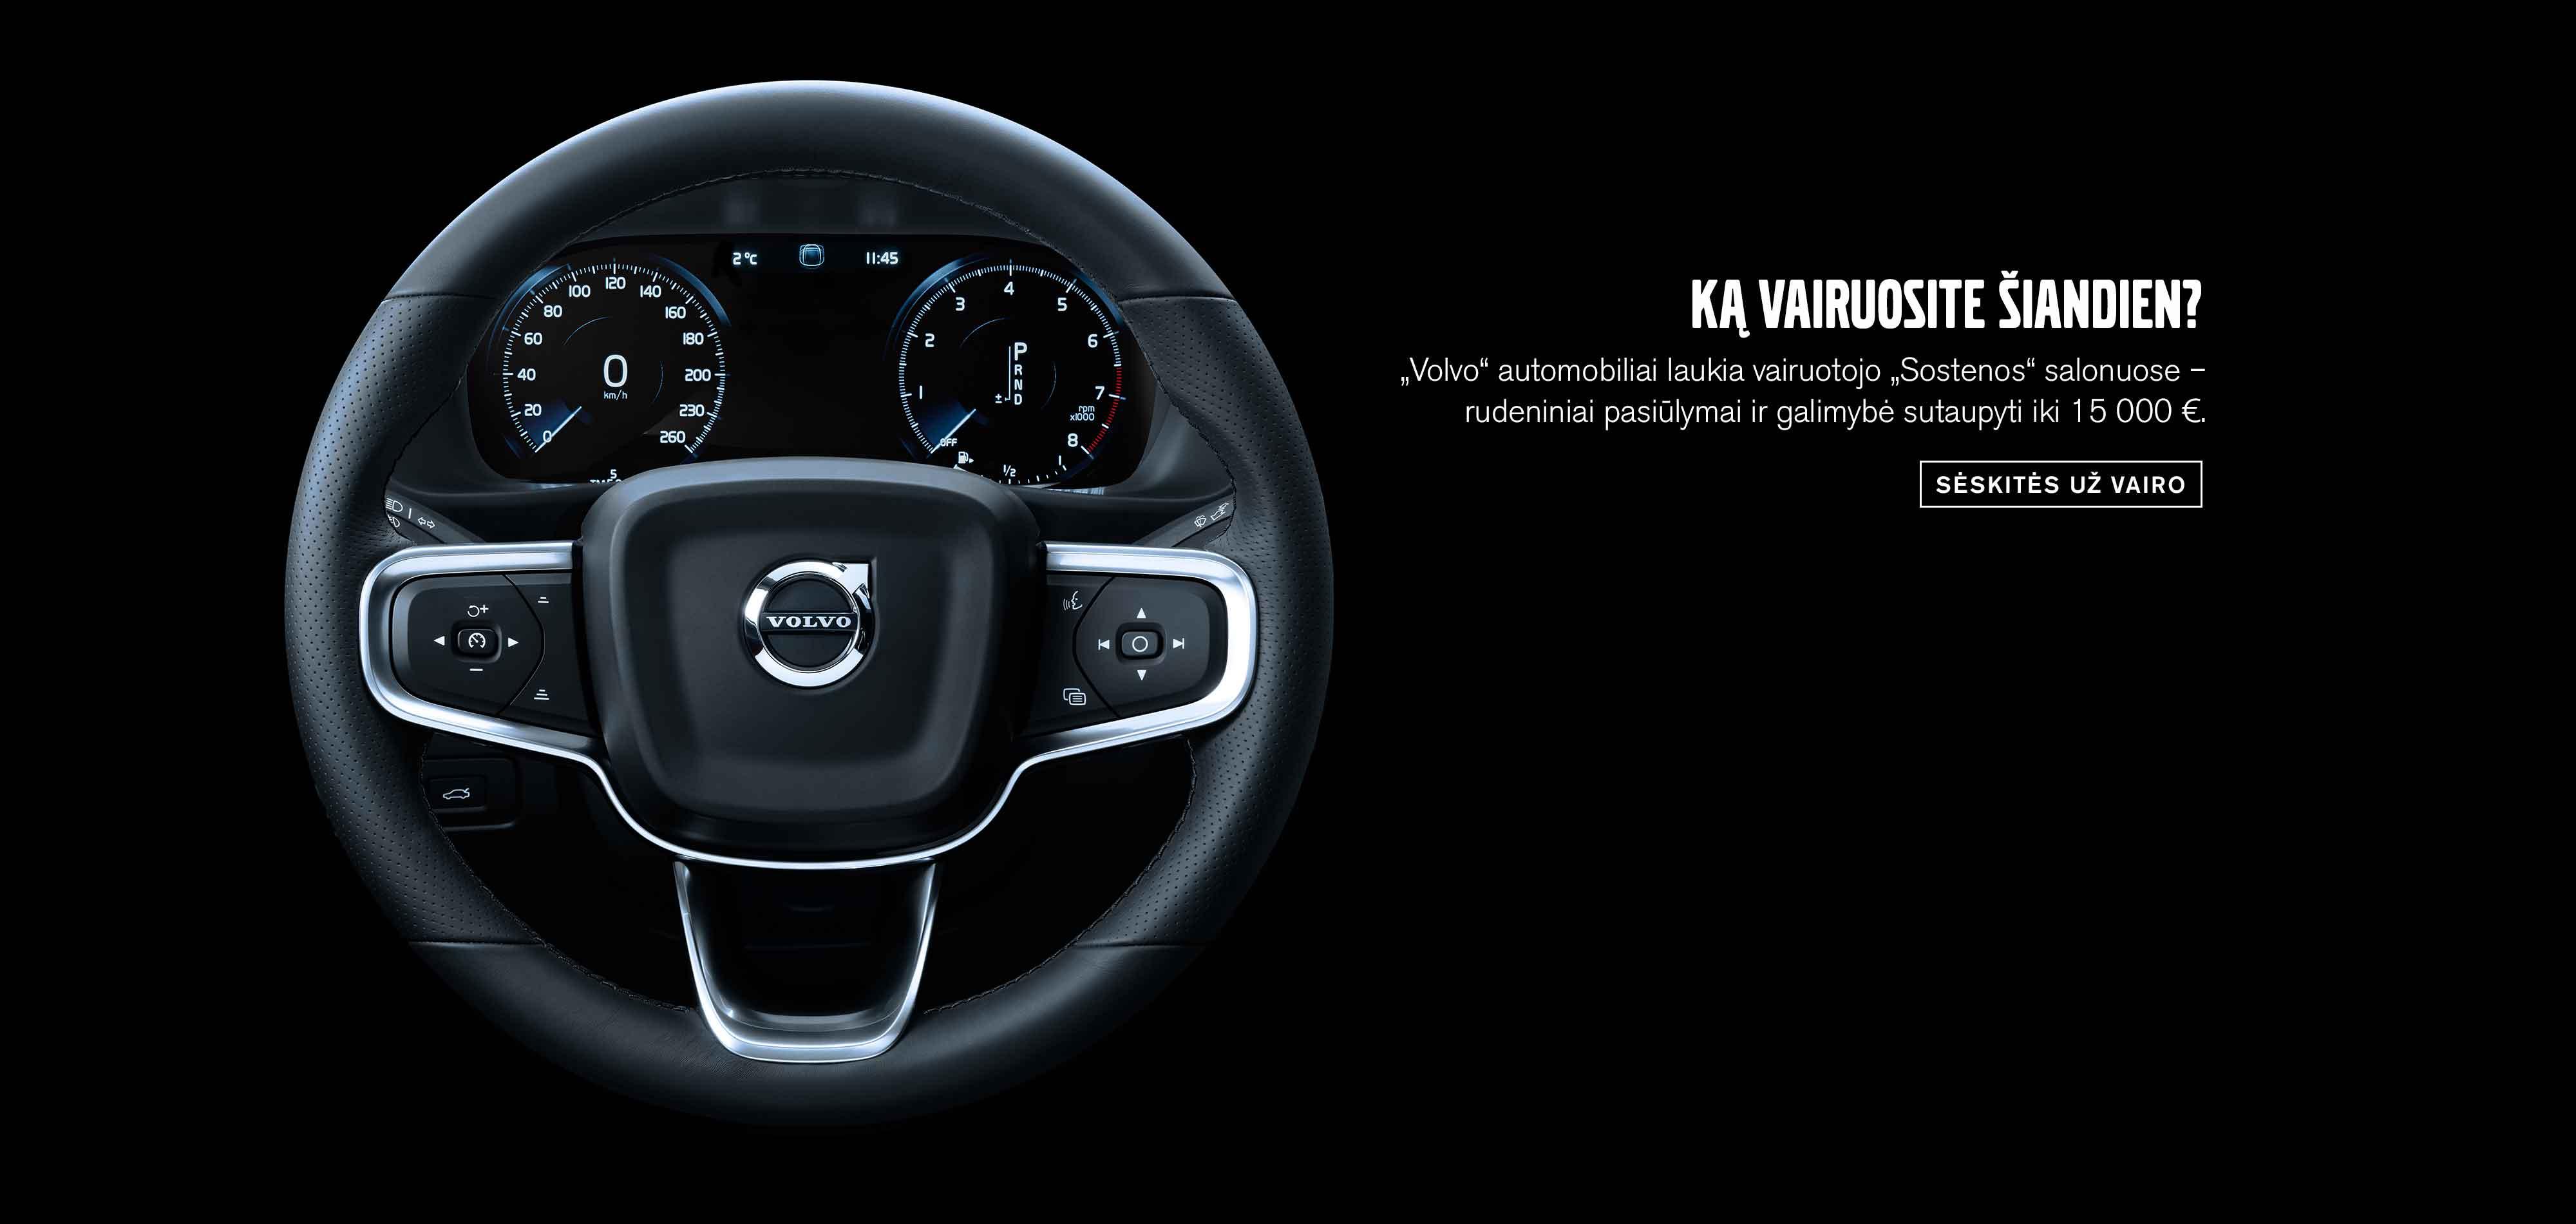 """Volvo"" rudens pasiūlymai"